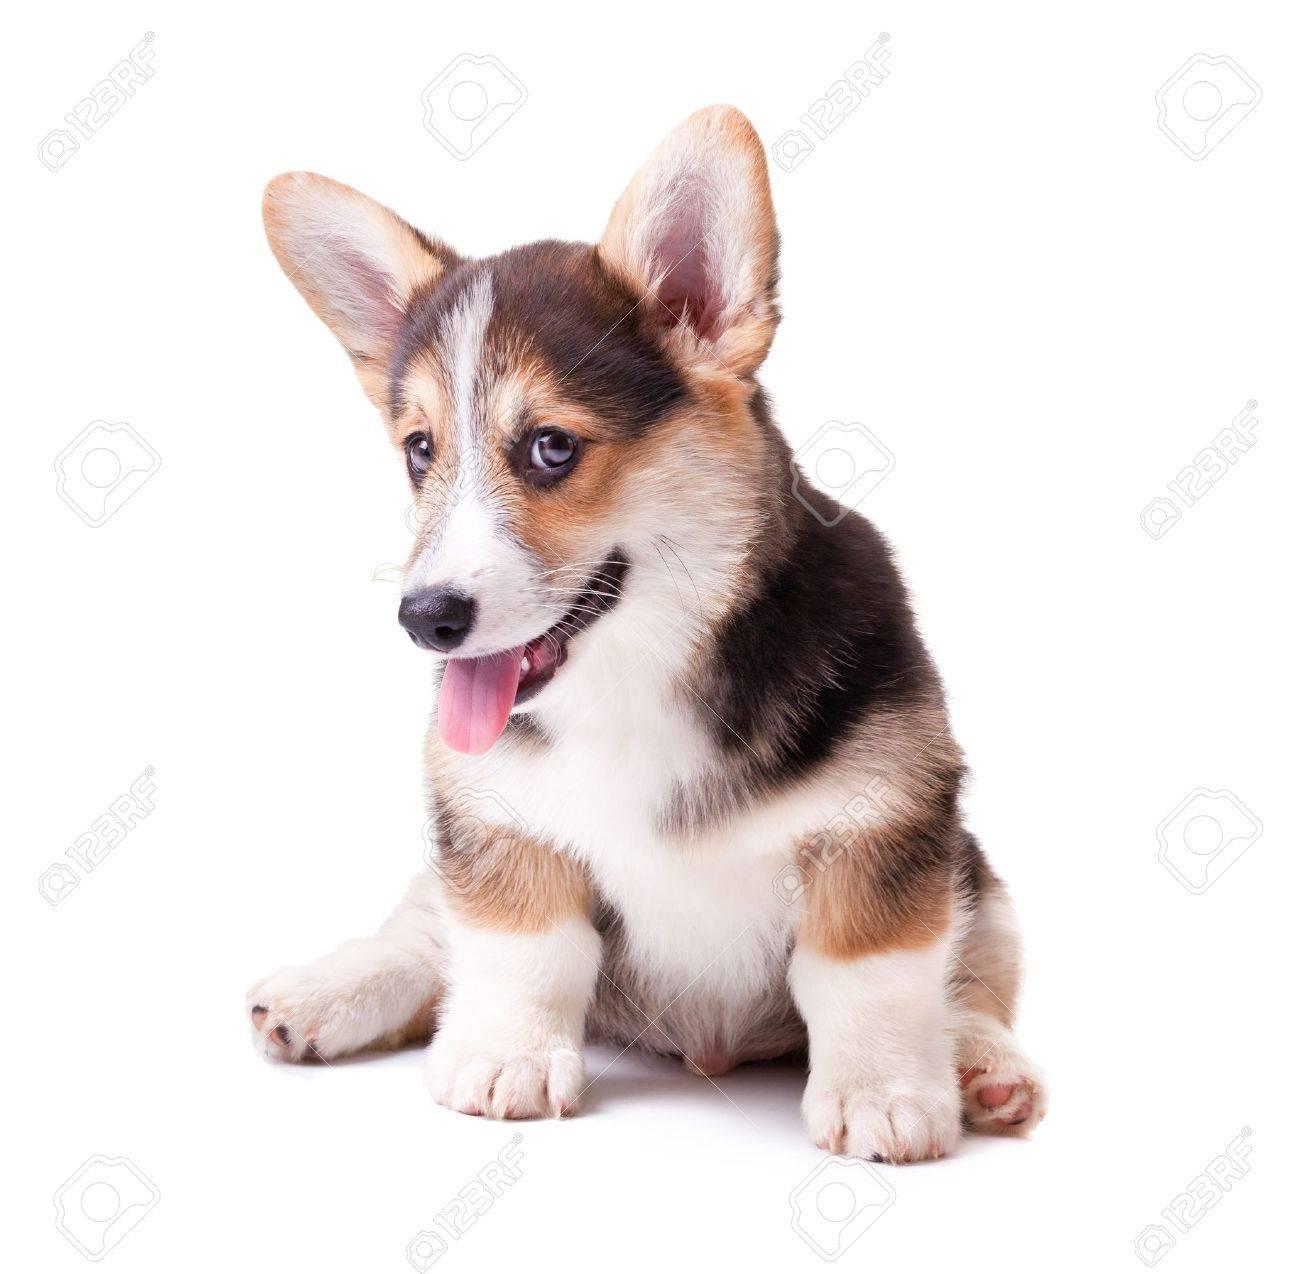 puppy dog breed Welsh Corgi, Pembroke on white Stock Photo - 13250570